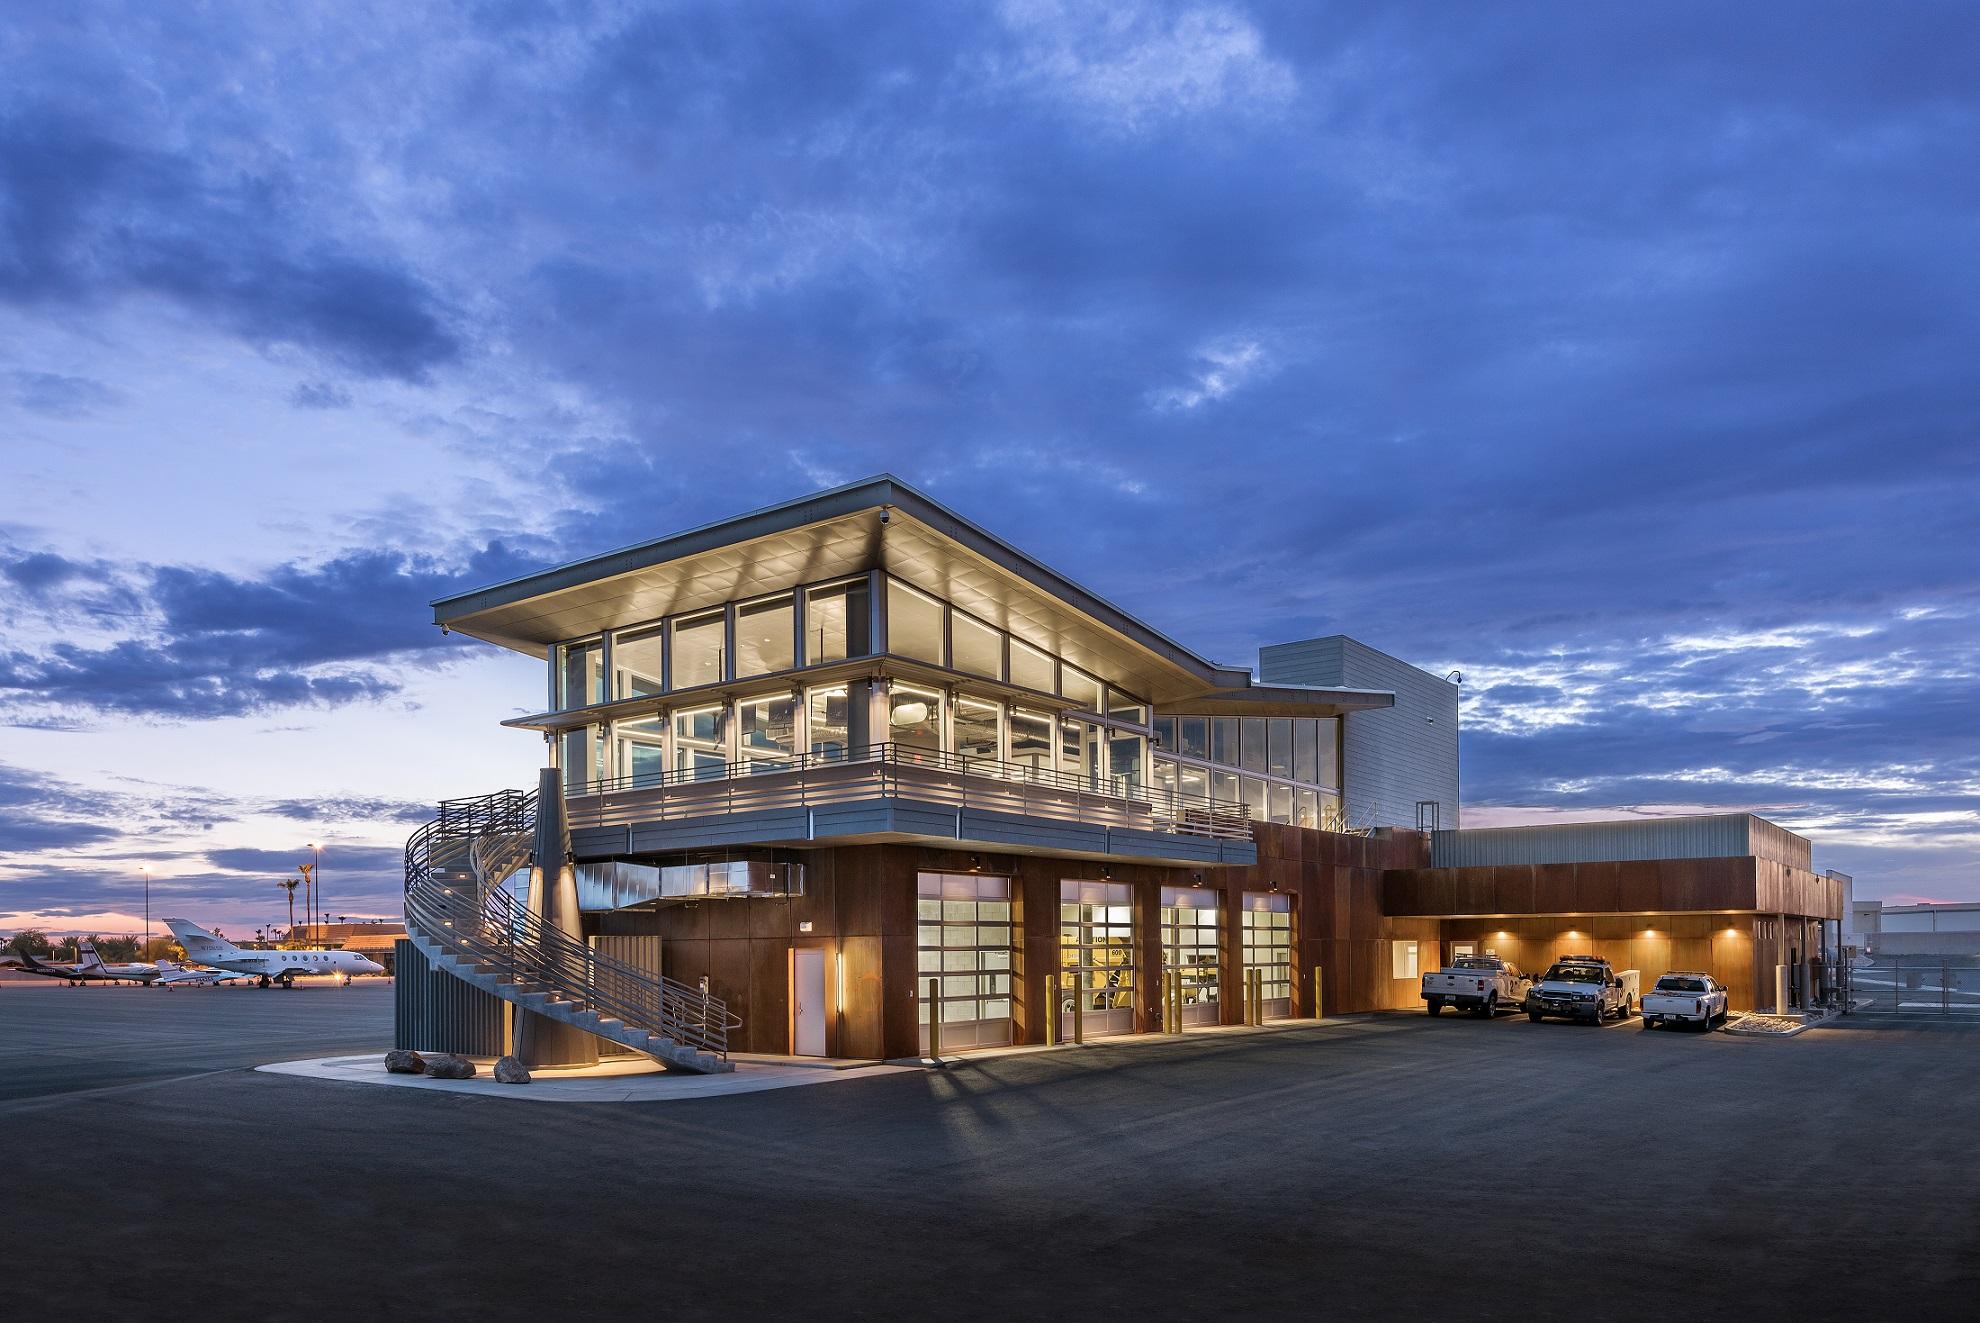 Award of Merit - Scottsdale Airport Operations CenterRobert Singer - Robert Singer & Associates